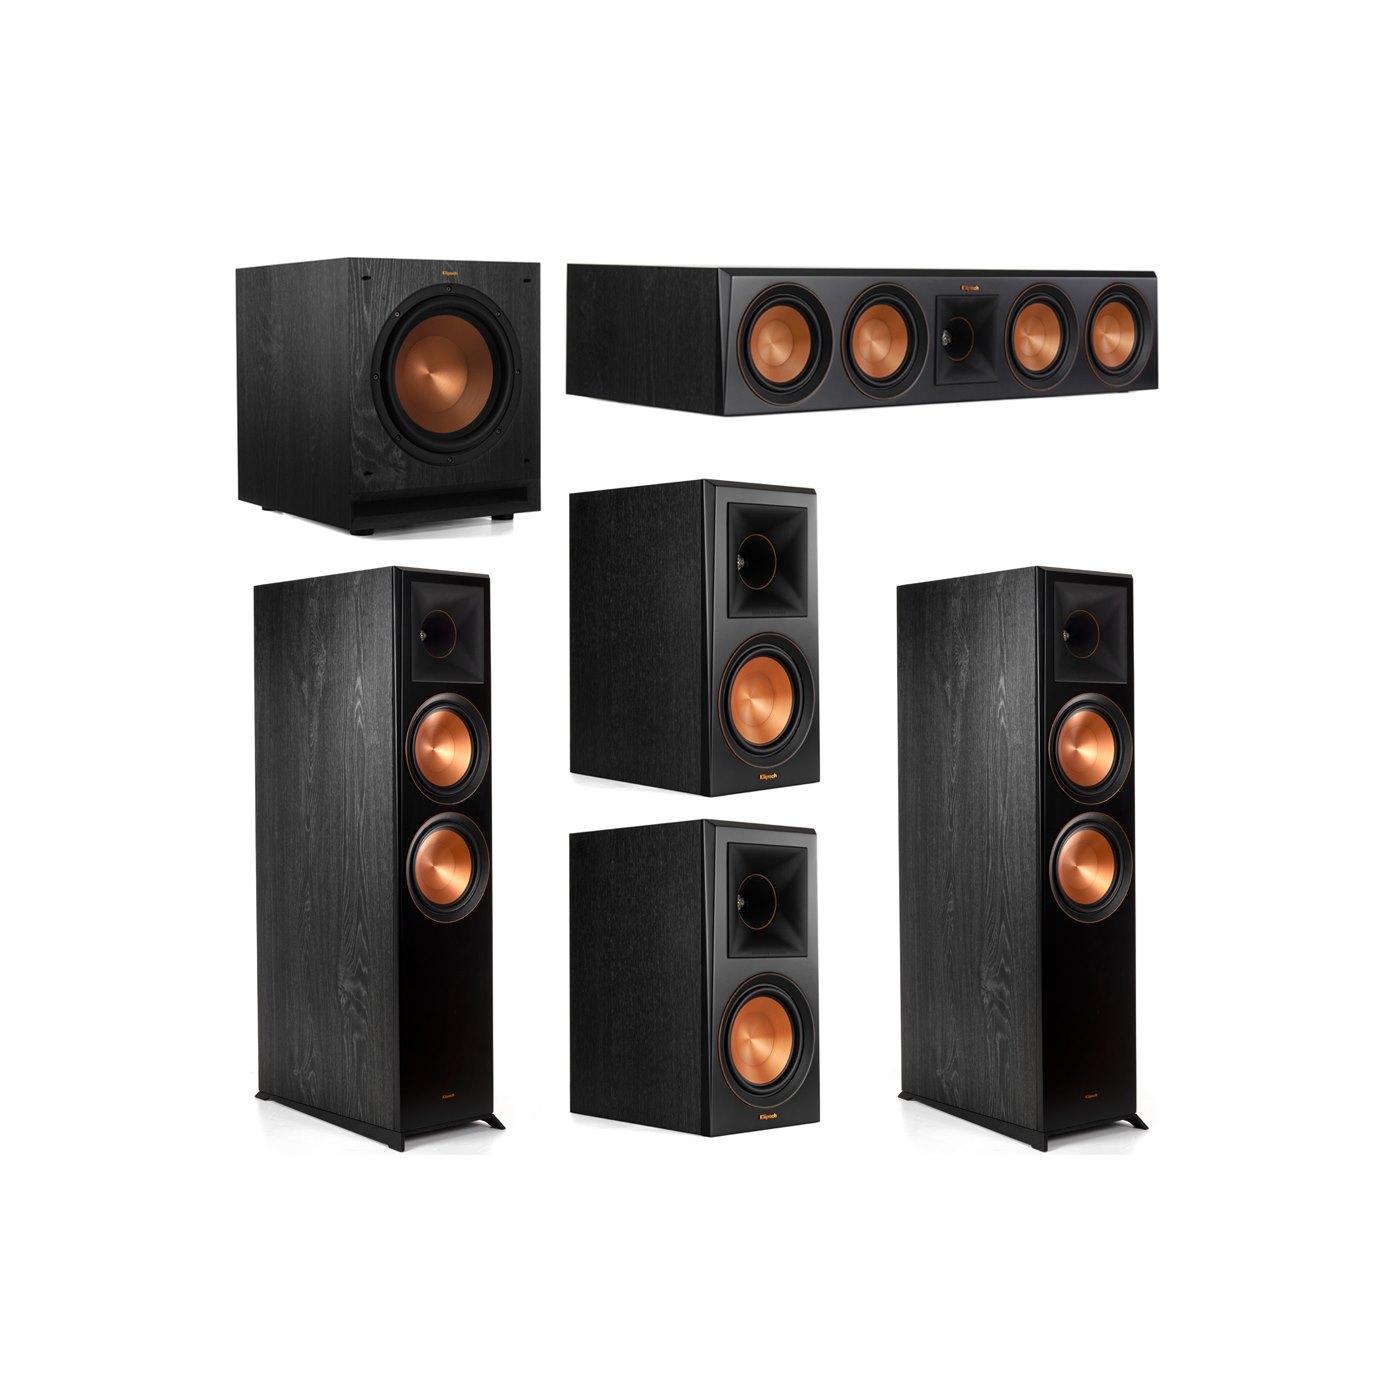 Klipsch 5.1 System with 2 RP-8000F Floorstanding Speakers, 1 Klipsch RP-504C Center Speaker, 2 Klipsch RP-600M Surround Speakers, 1 Klipsch SPL-100 Subwoofer